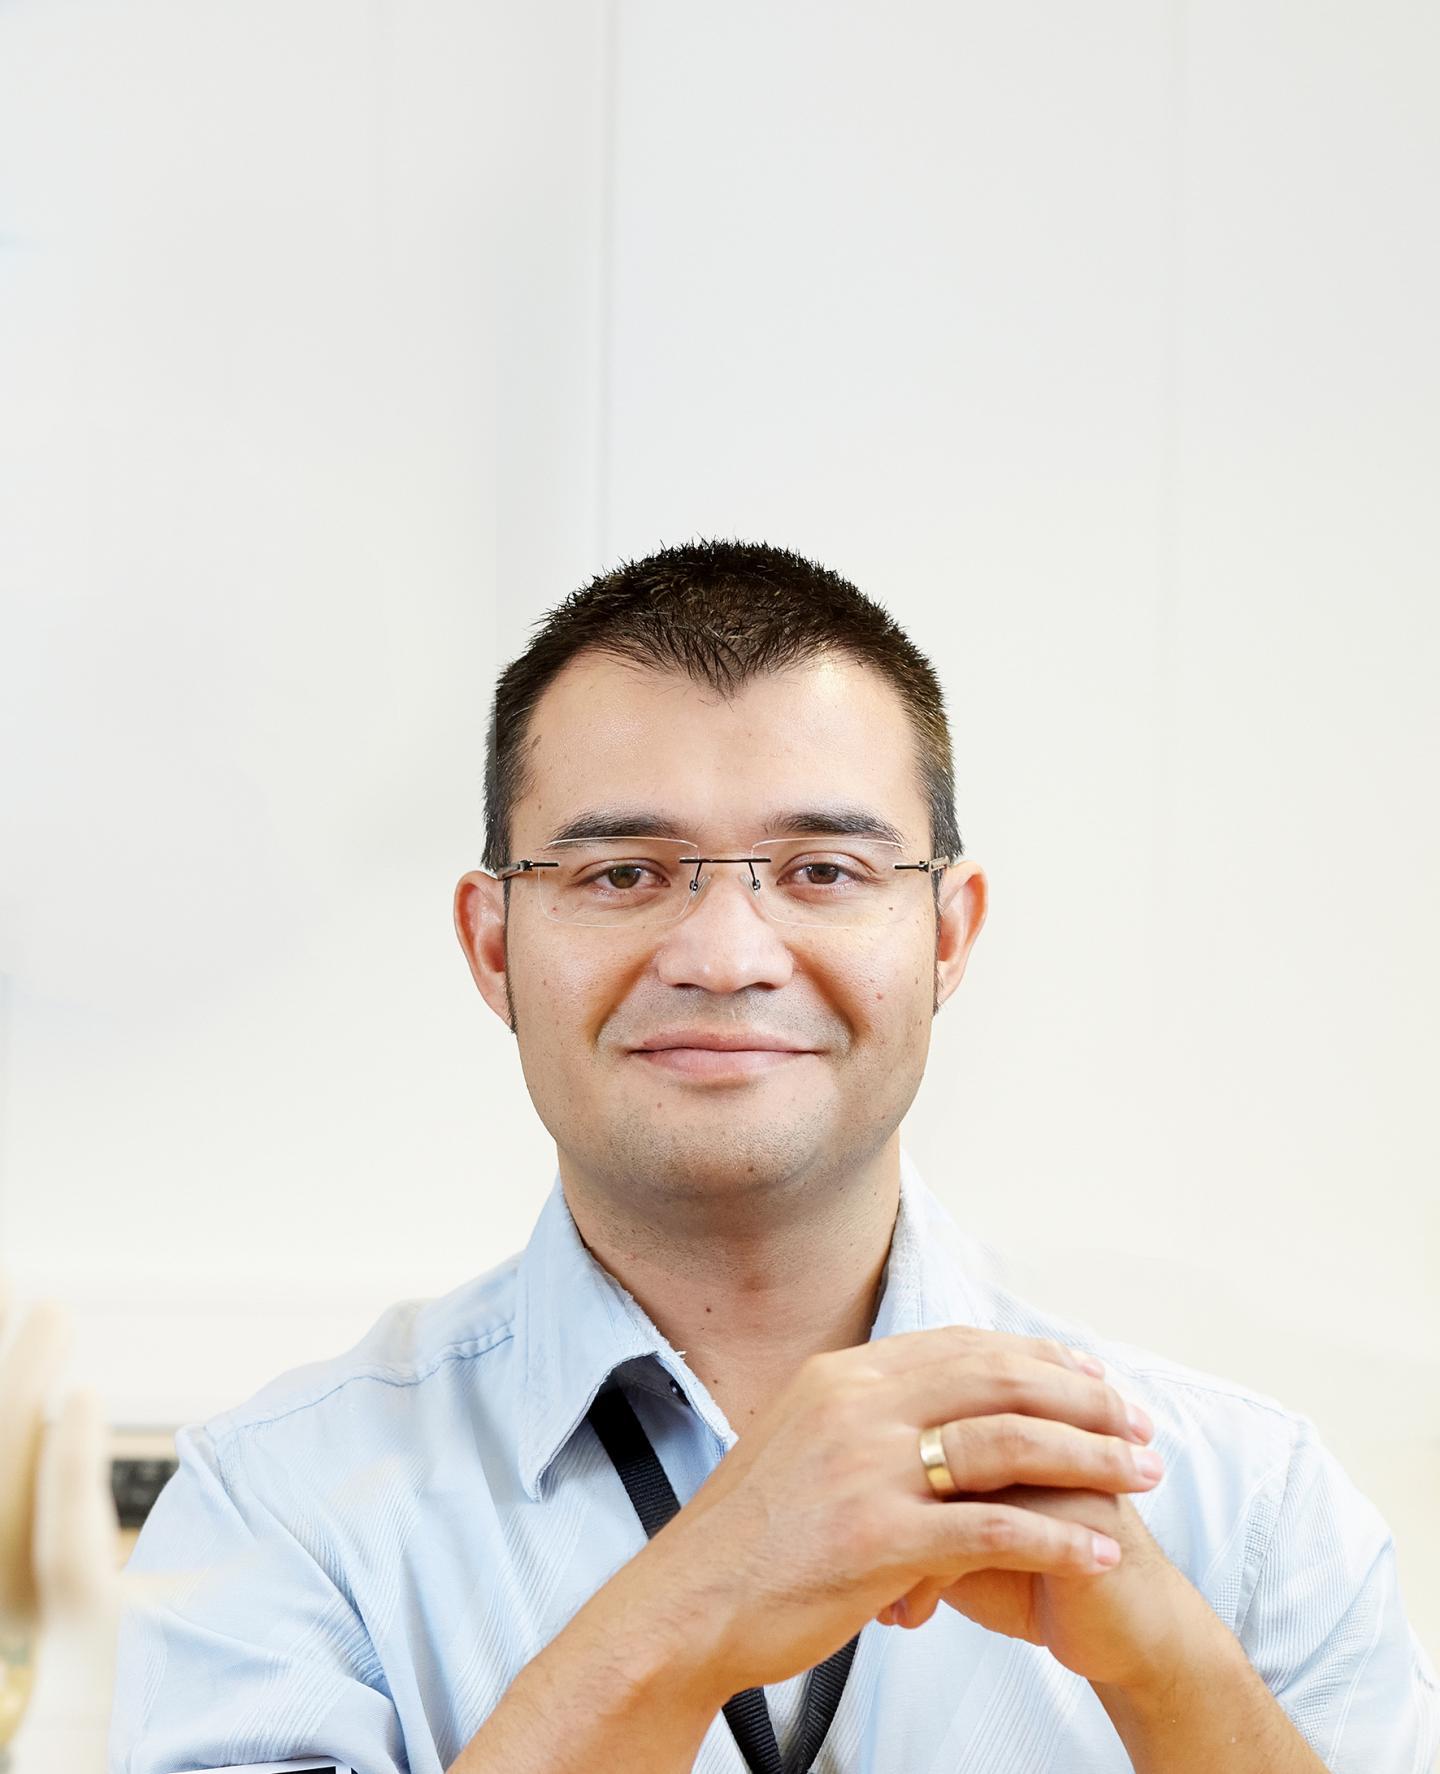 Max Ortiz Catalan,  Chalmers University of Technology